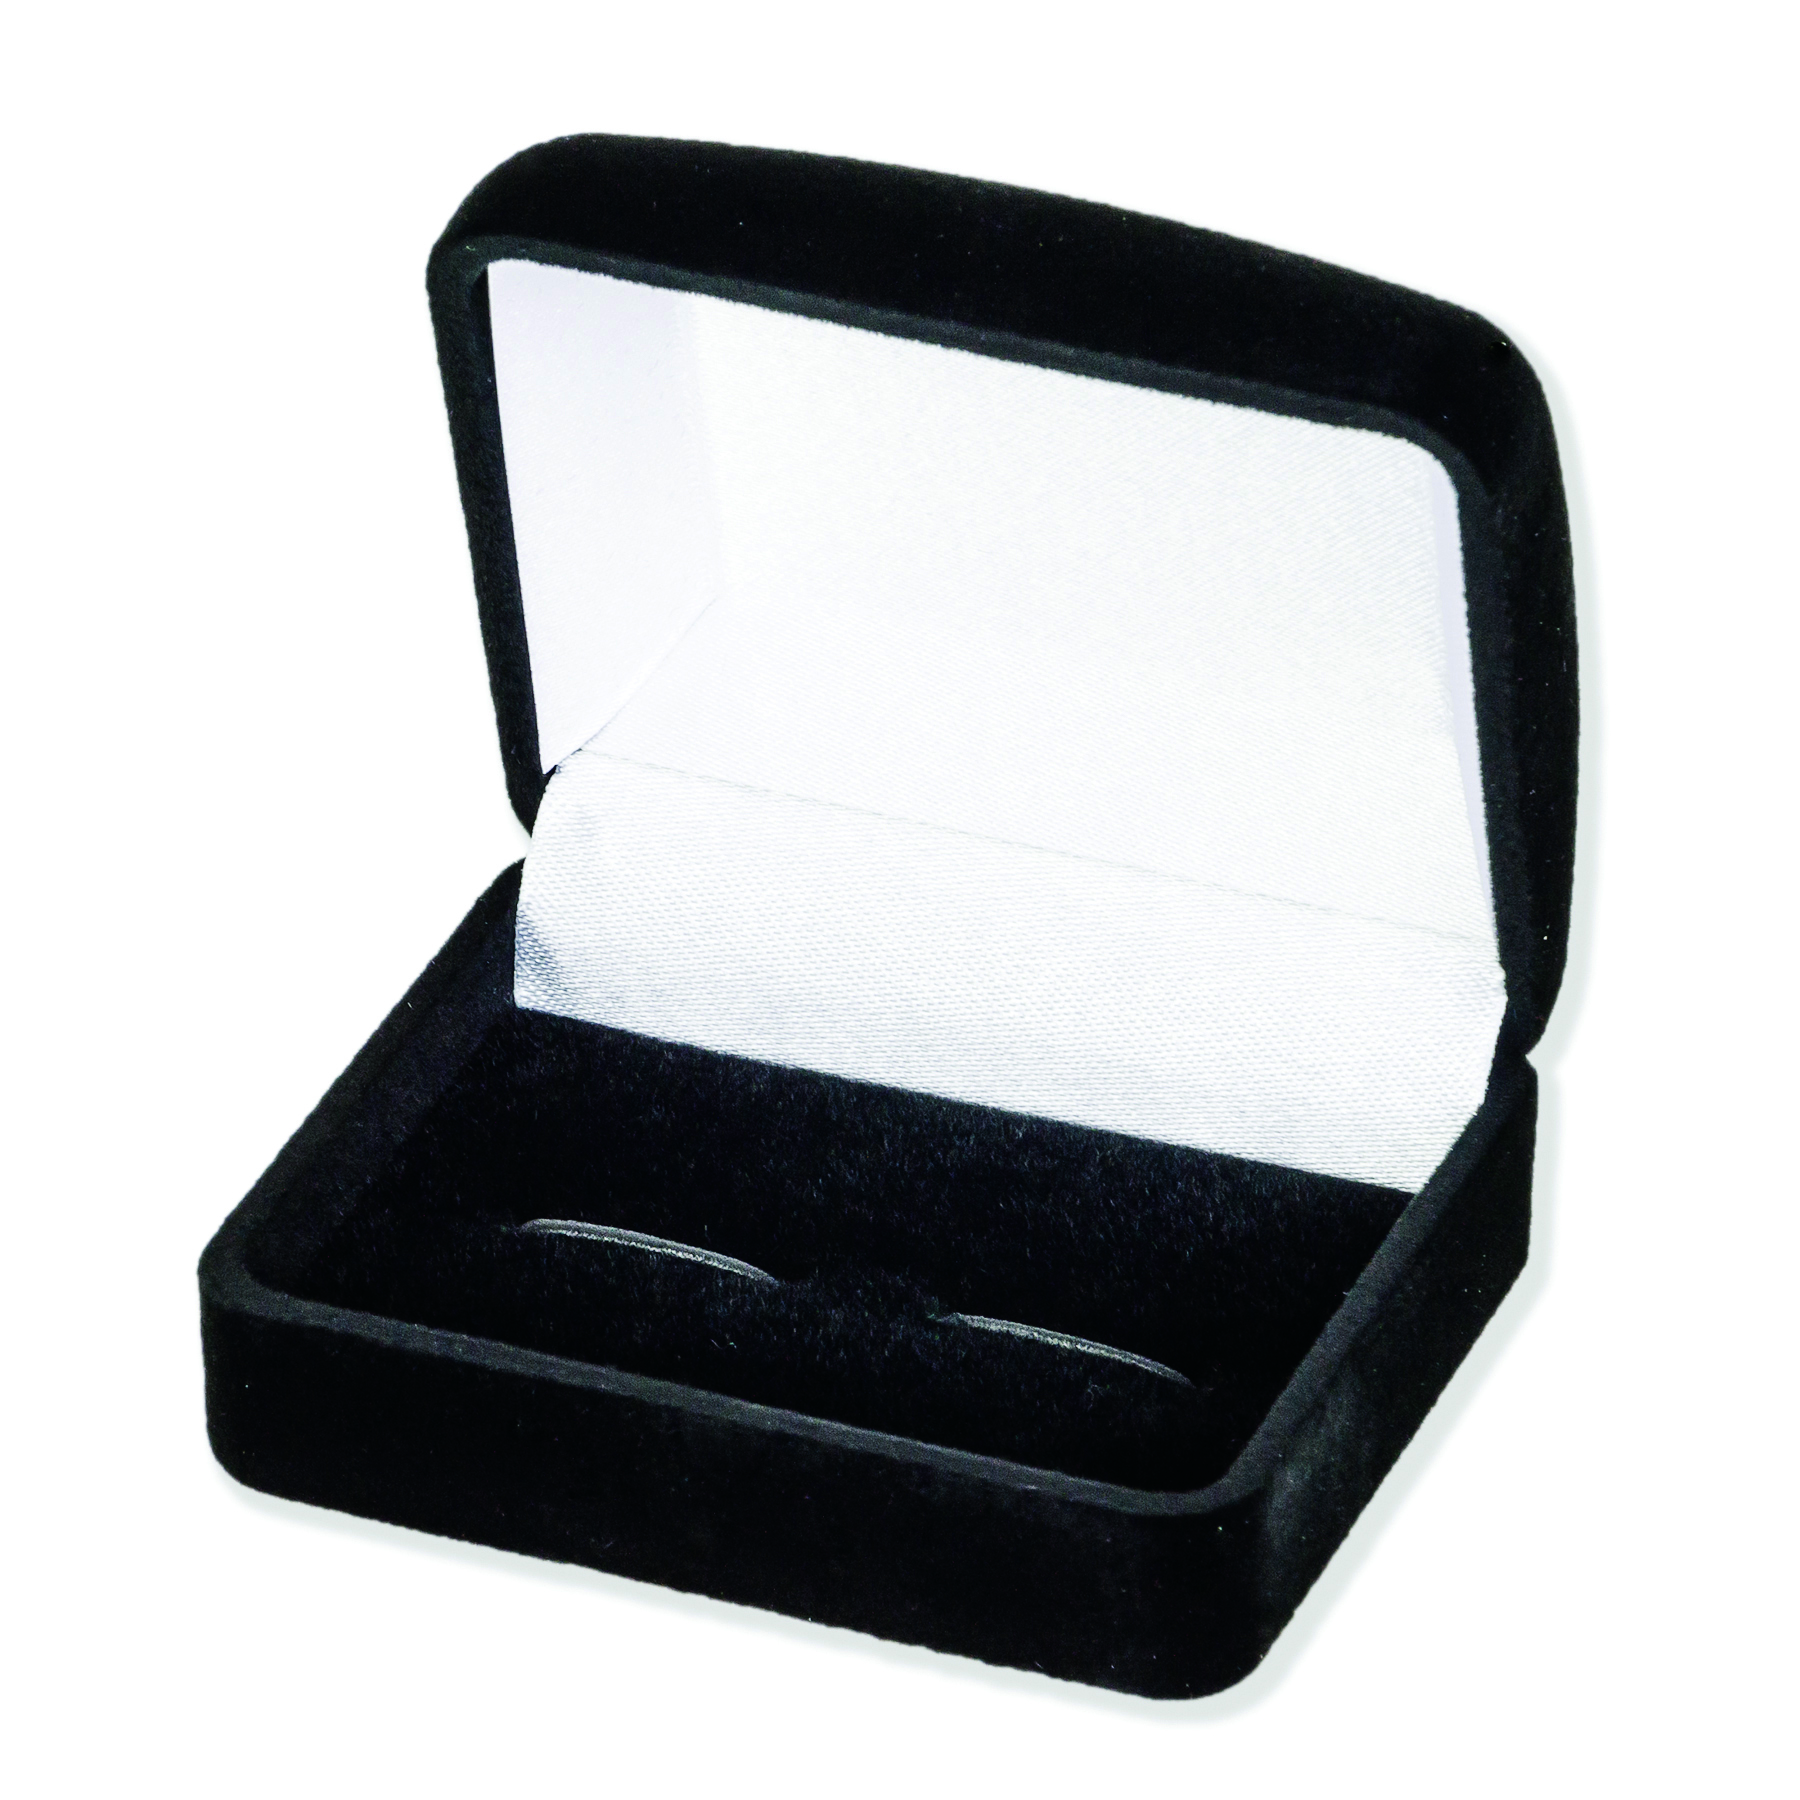 Modena Cufflink Boxes Image